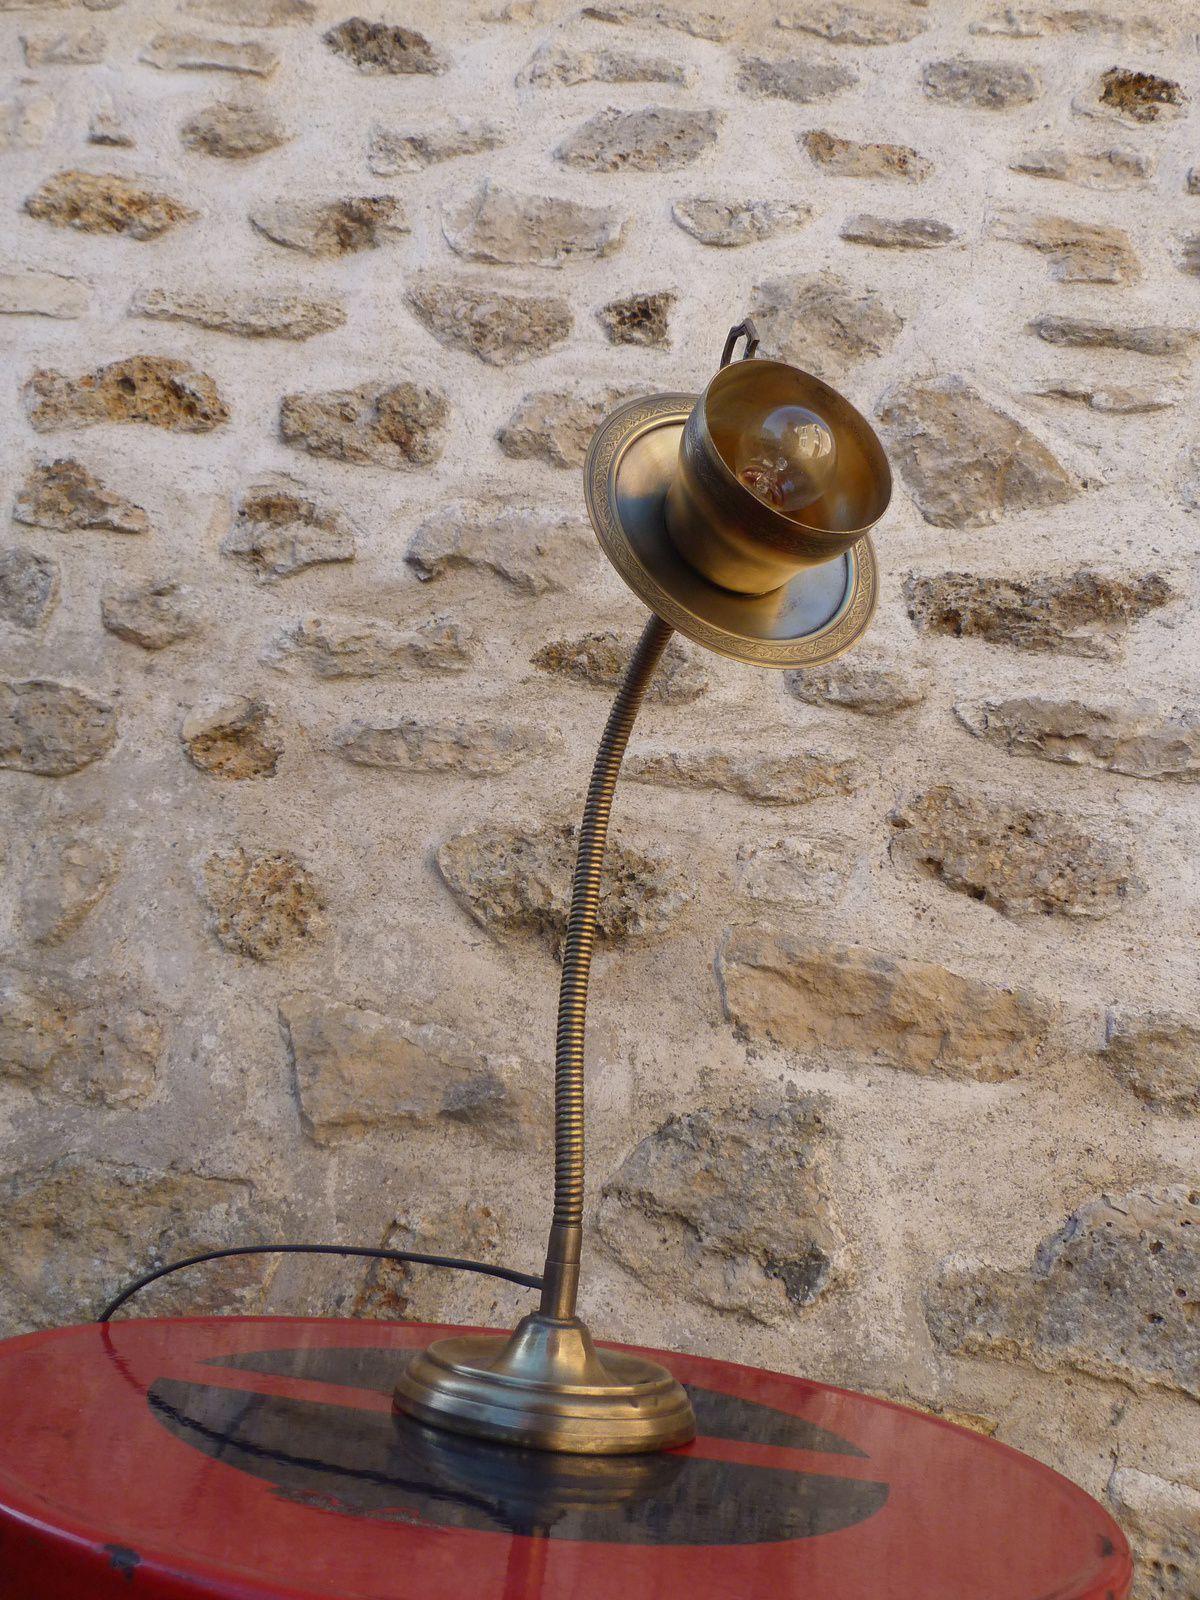 Lampe vintage flexible laiton &quot&#x3B;Do you want a cup of tea ?&quot&#x3B;